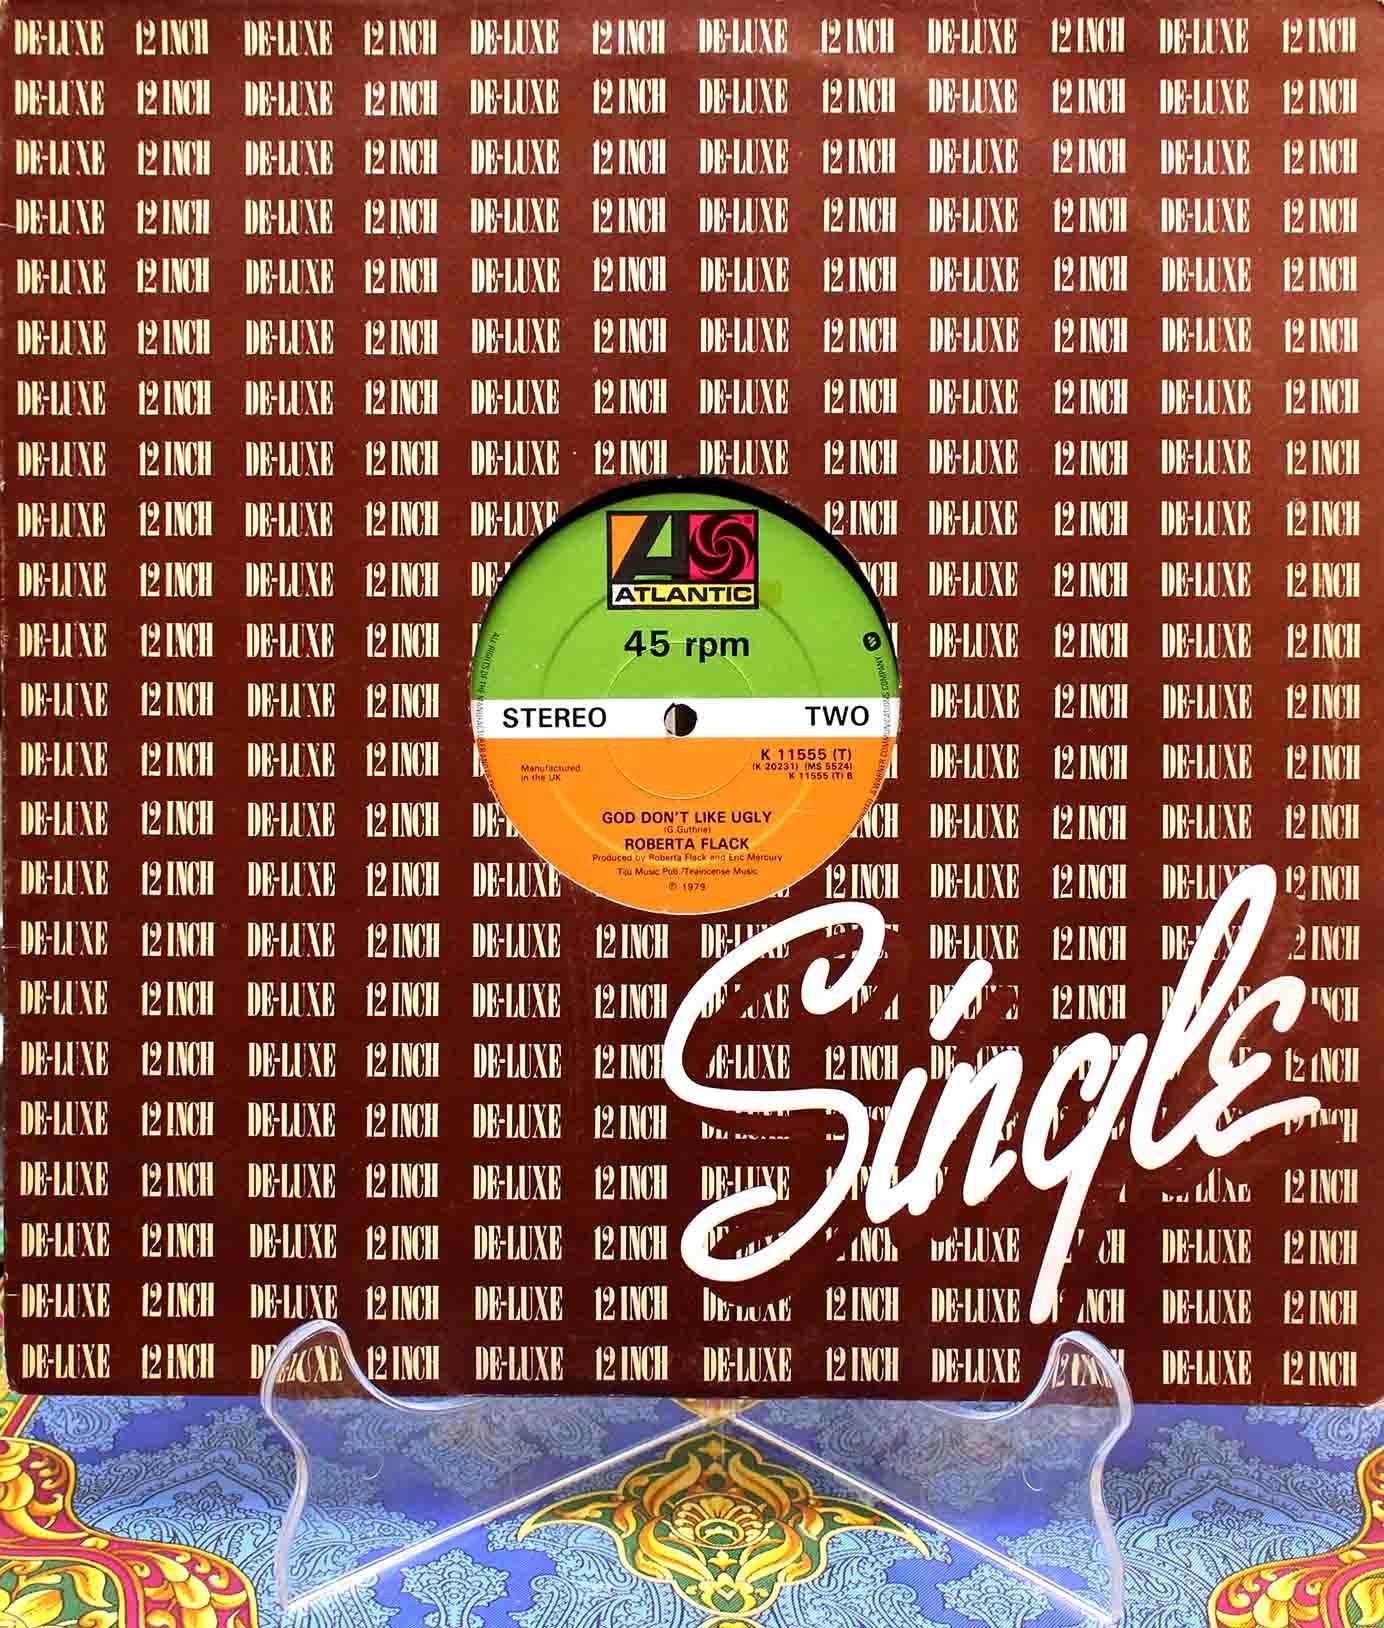 Roberta Flack – Dont Make Me Wait Too Long 02